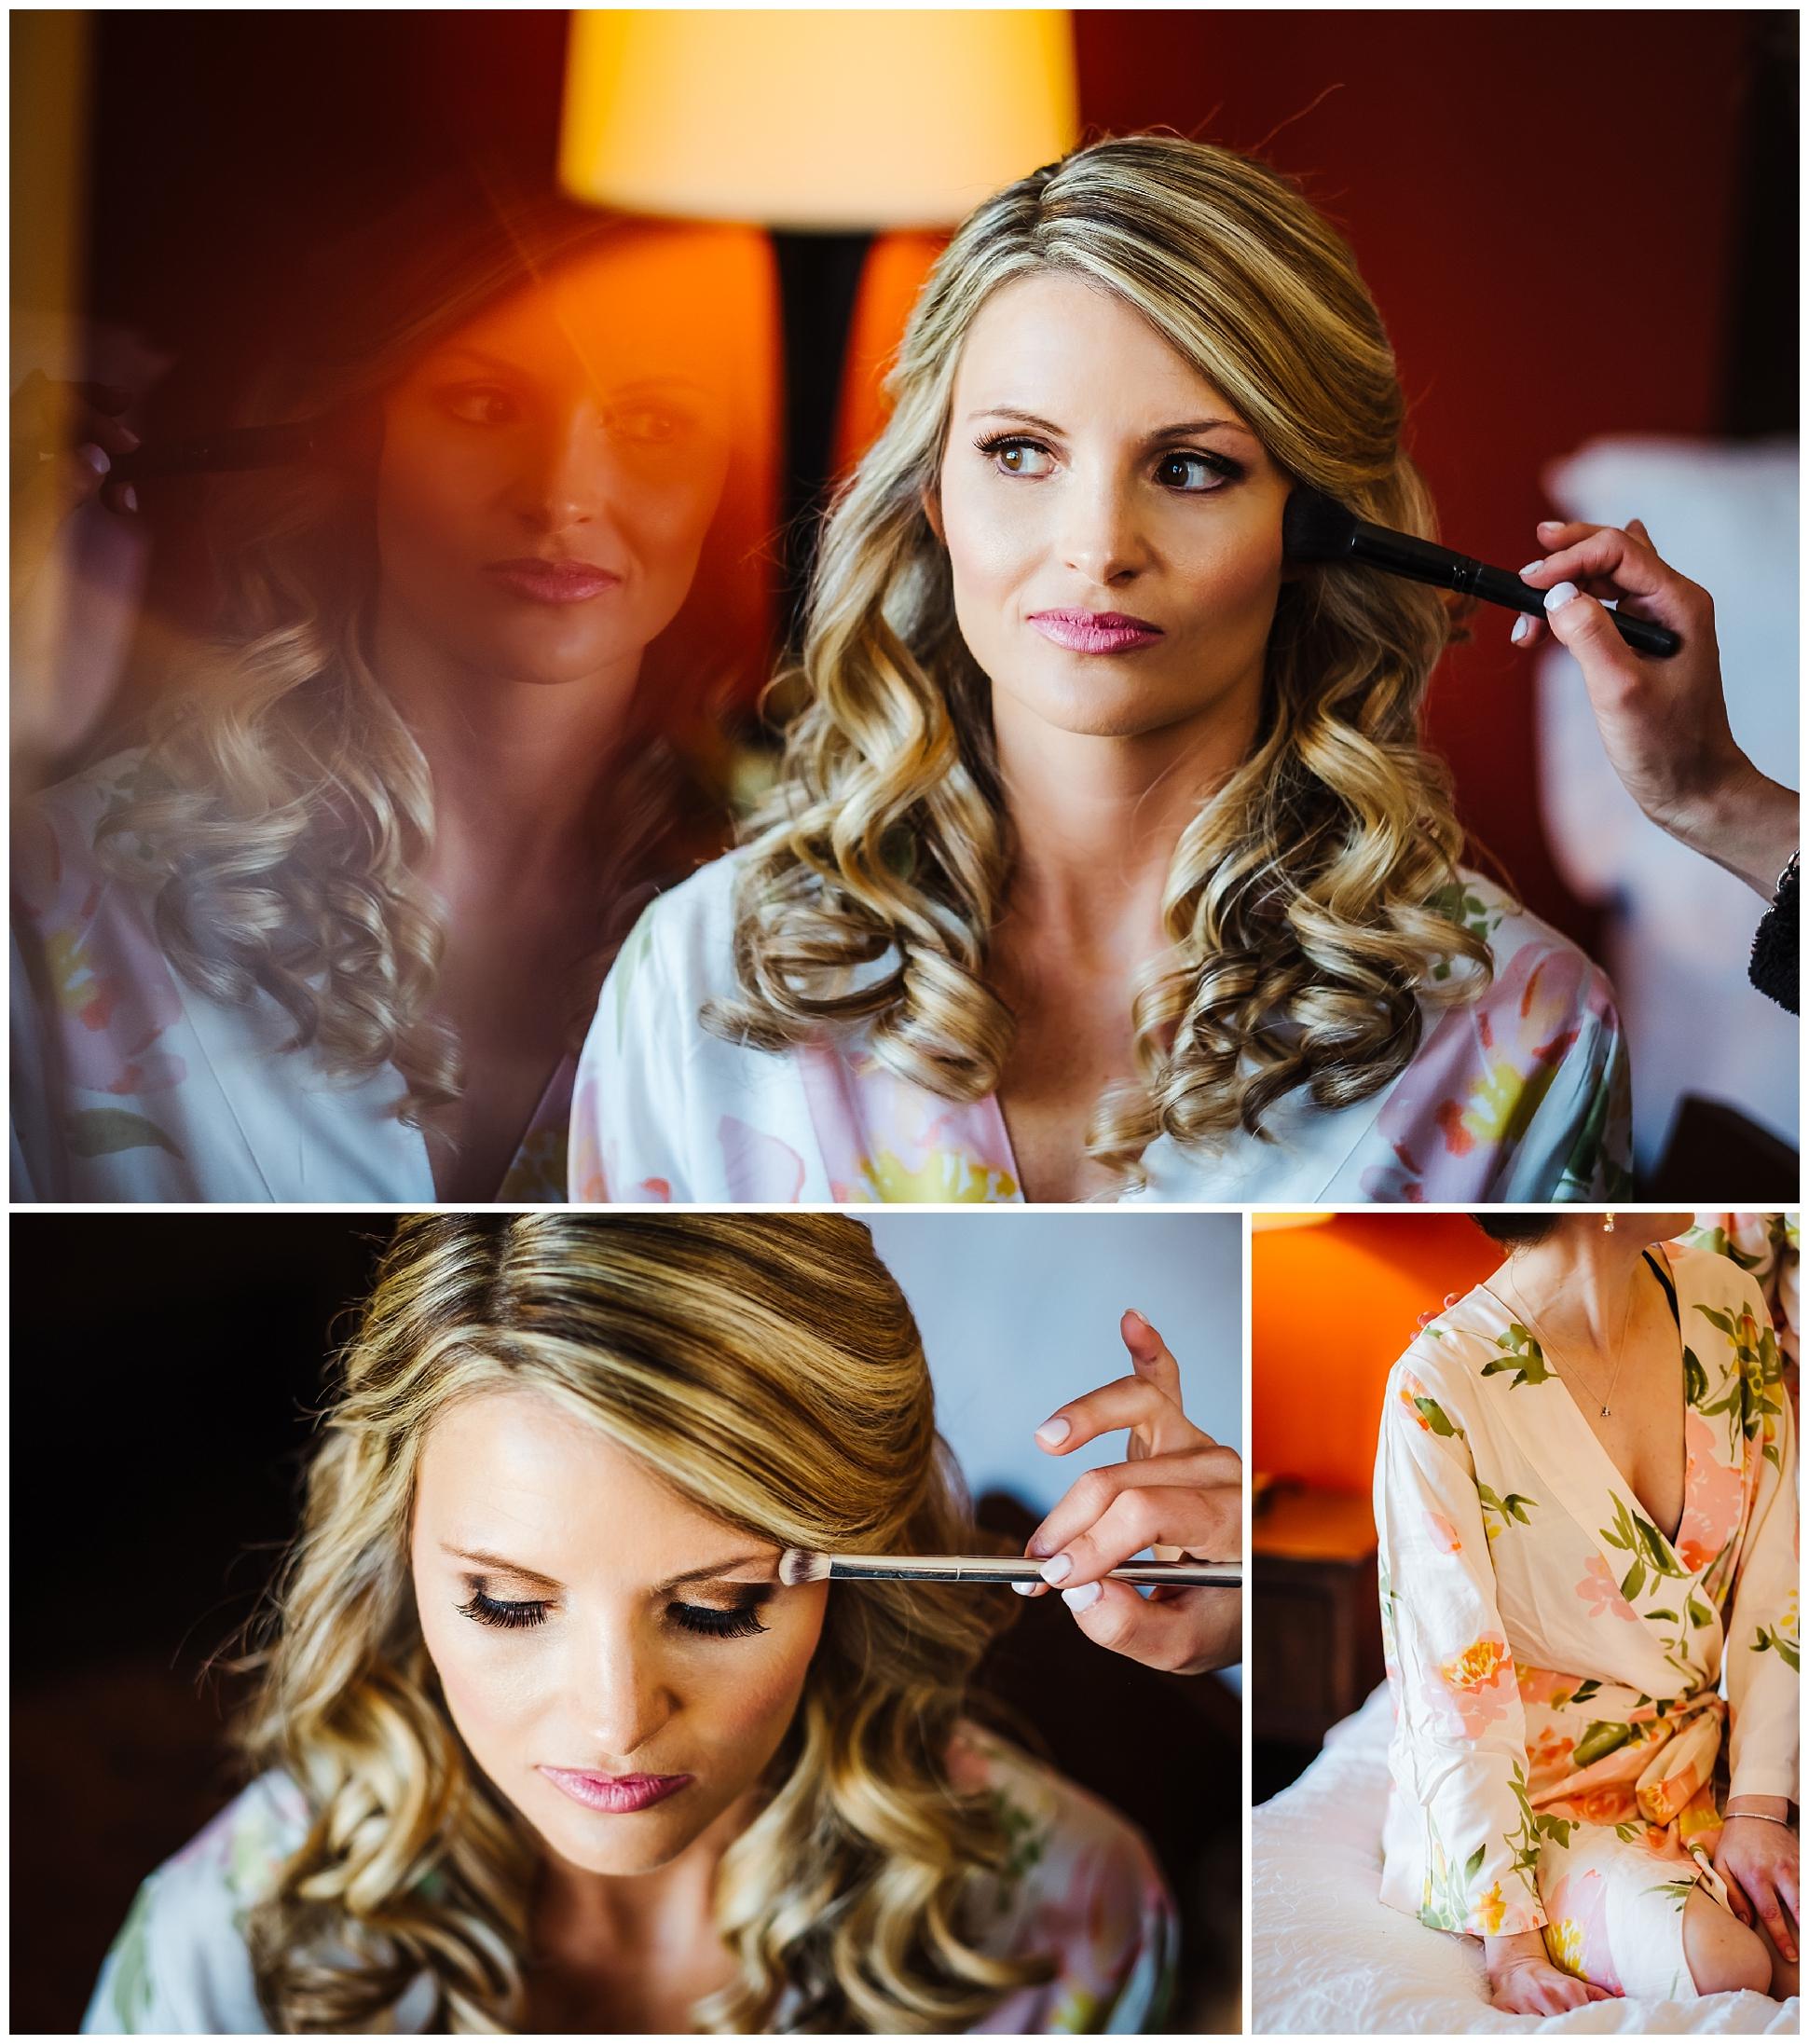 tampa-bradenton-wedding-photographer-south-florida-museum-classic-blush-gold-alpacas-sparklers_0005.jpg